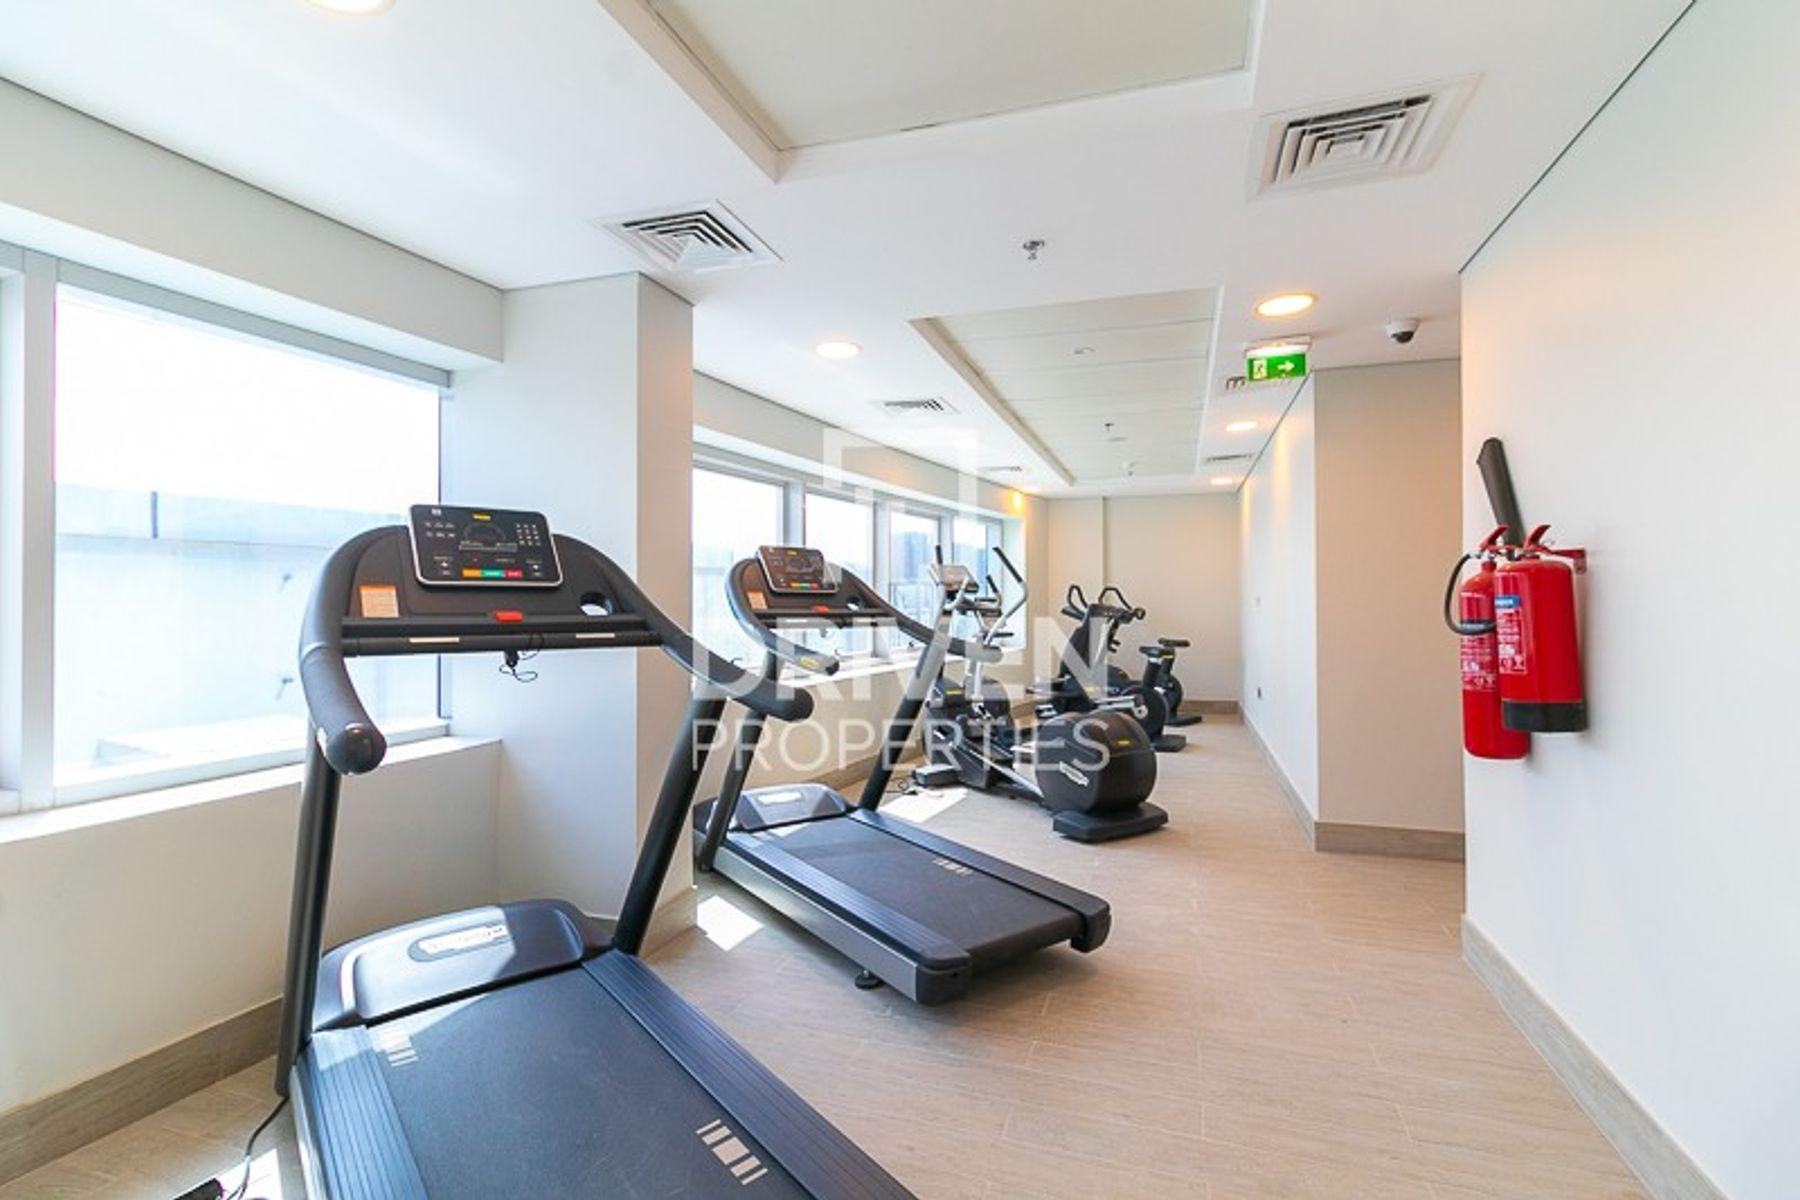 Apartment for Rent in Al Dhabi Tower, Arjan